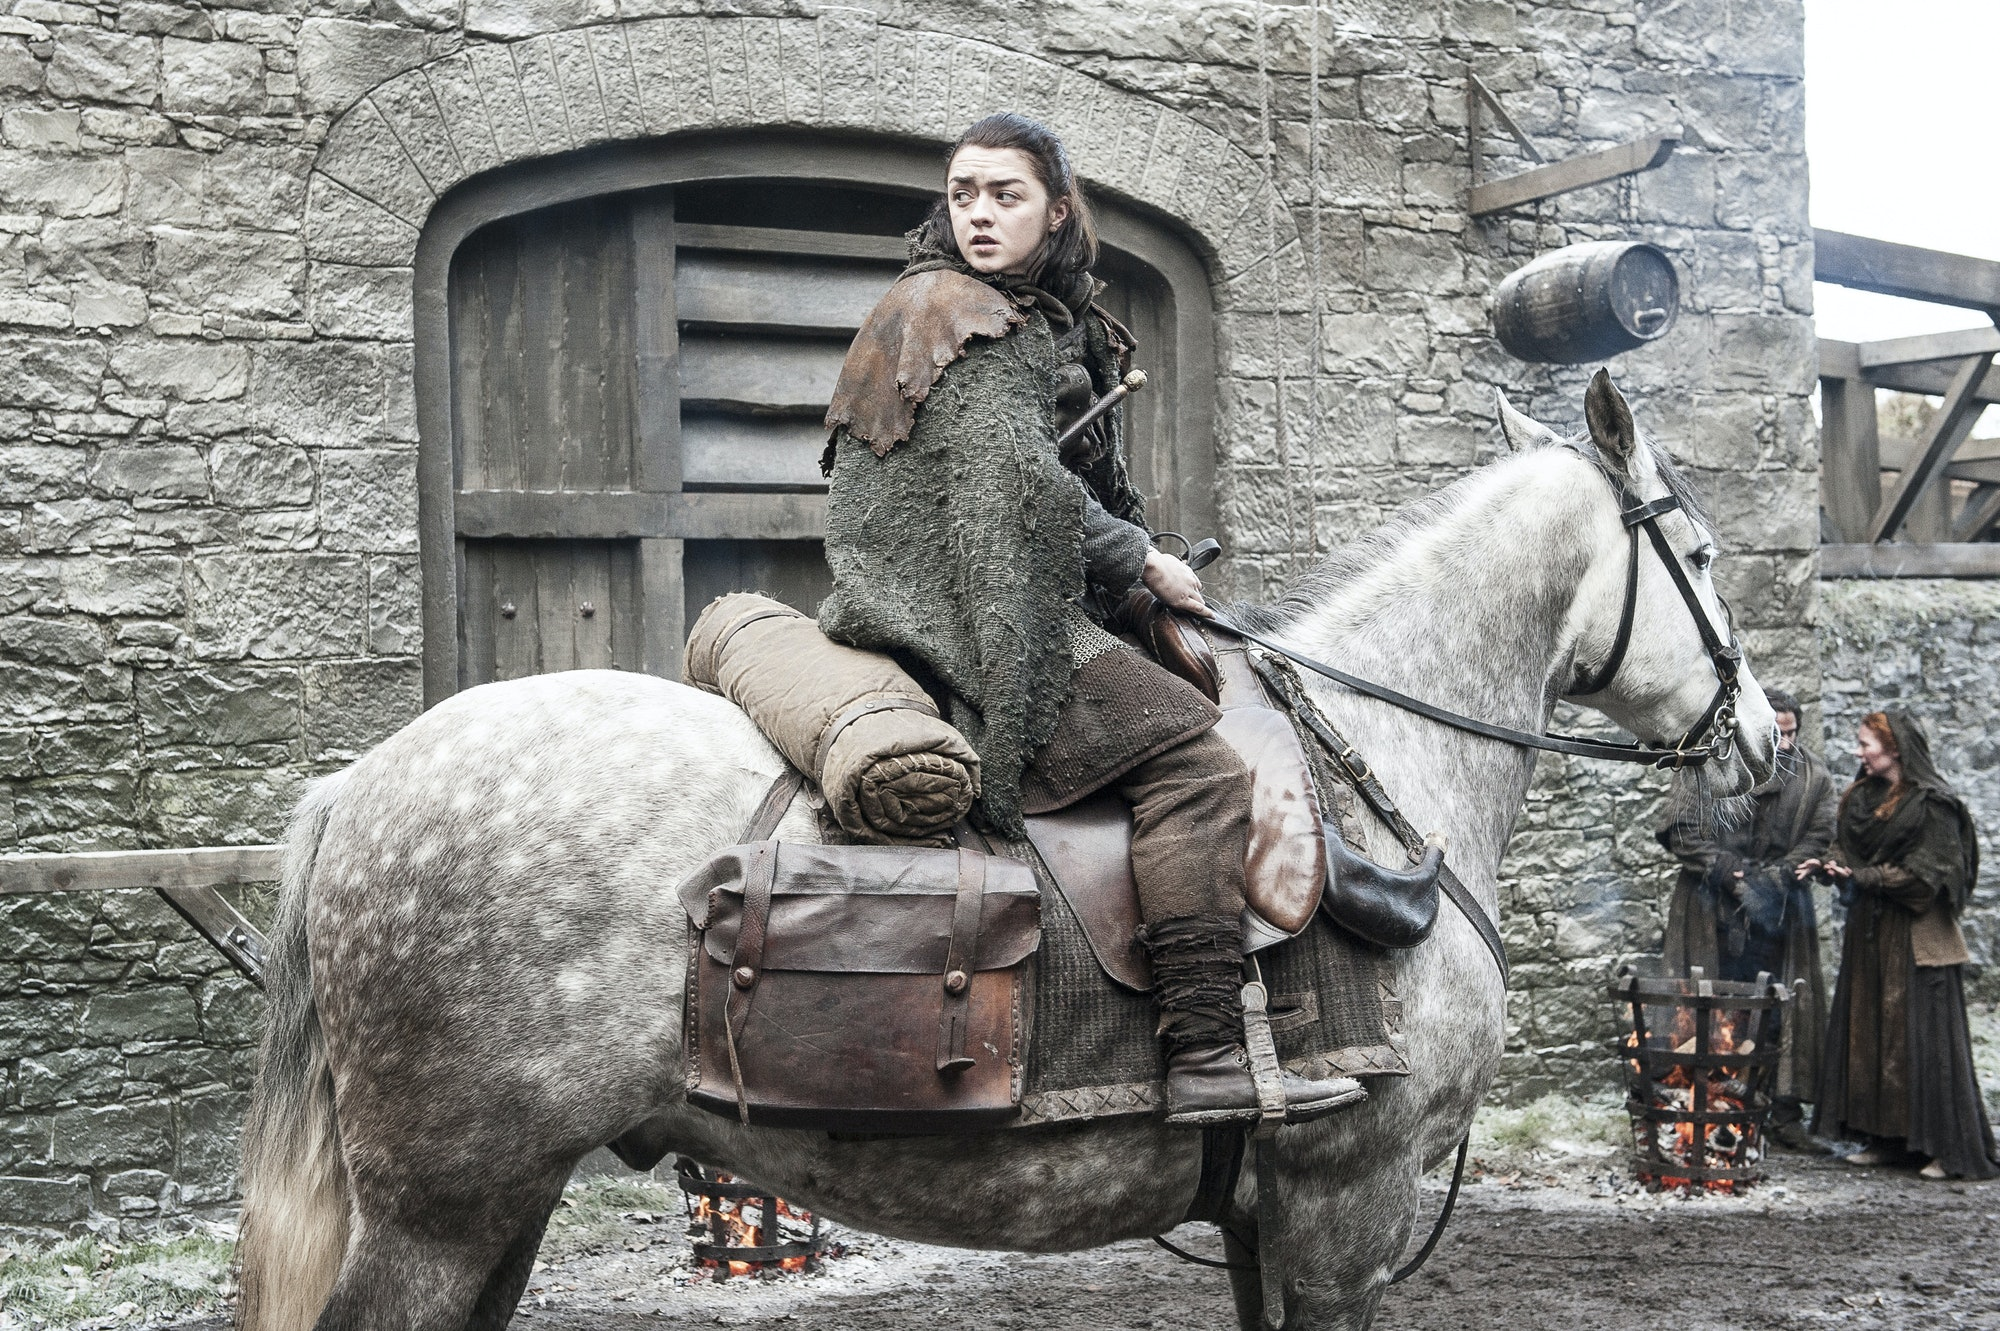 Maisie Williams as Arya Stark in 'Game of Thrones' Season 7 episode 2, 'Stormborn'